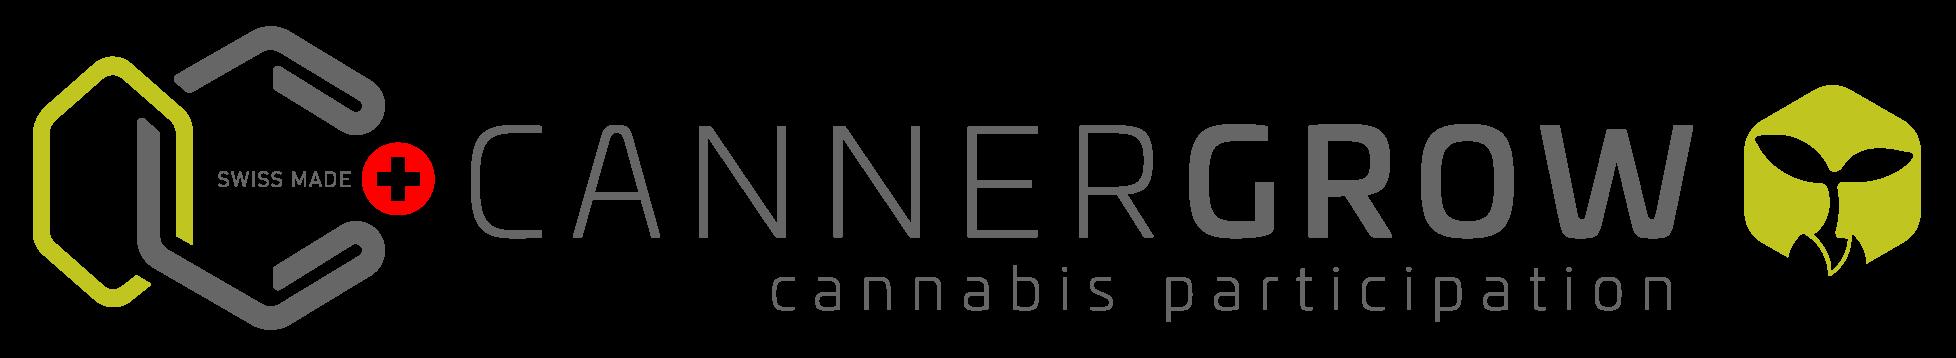 Cannergrow Logo